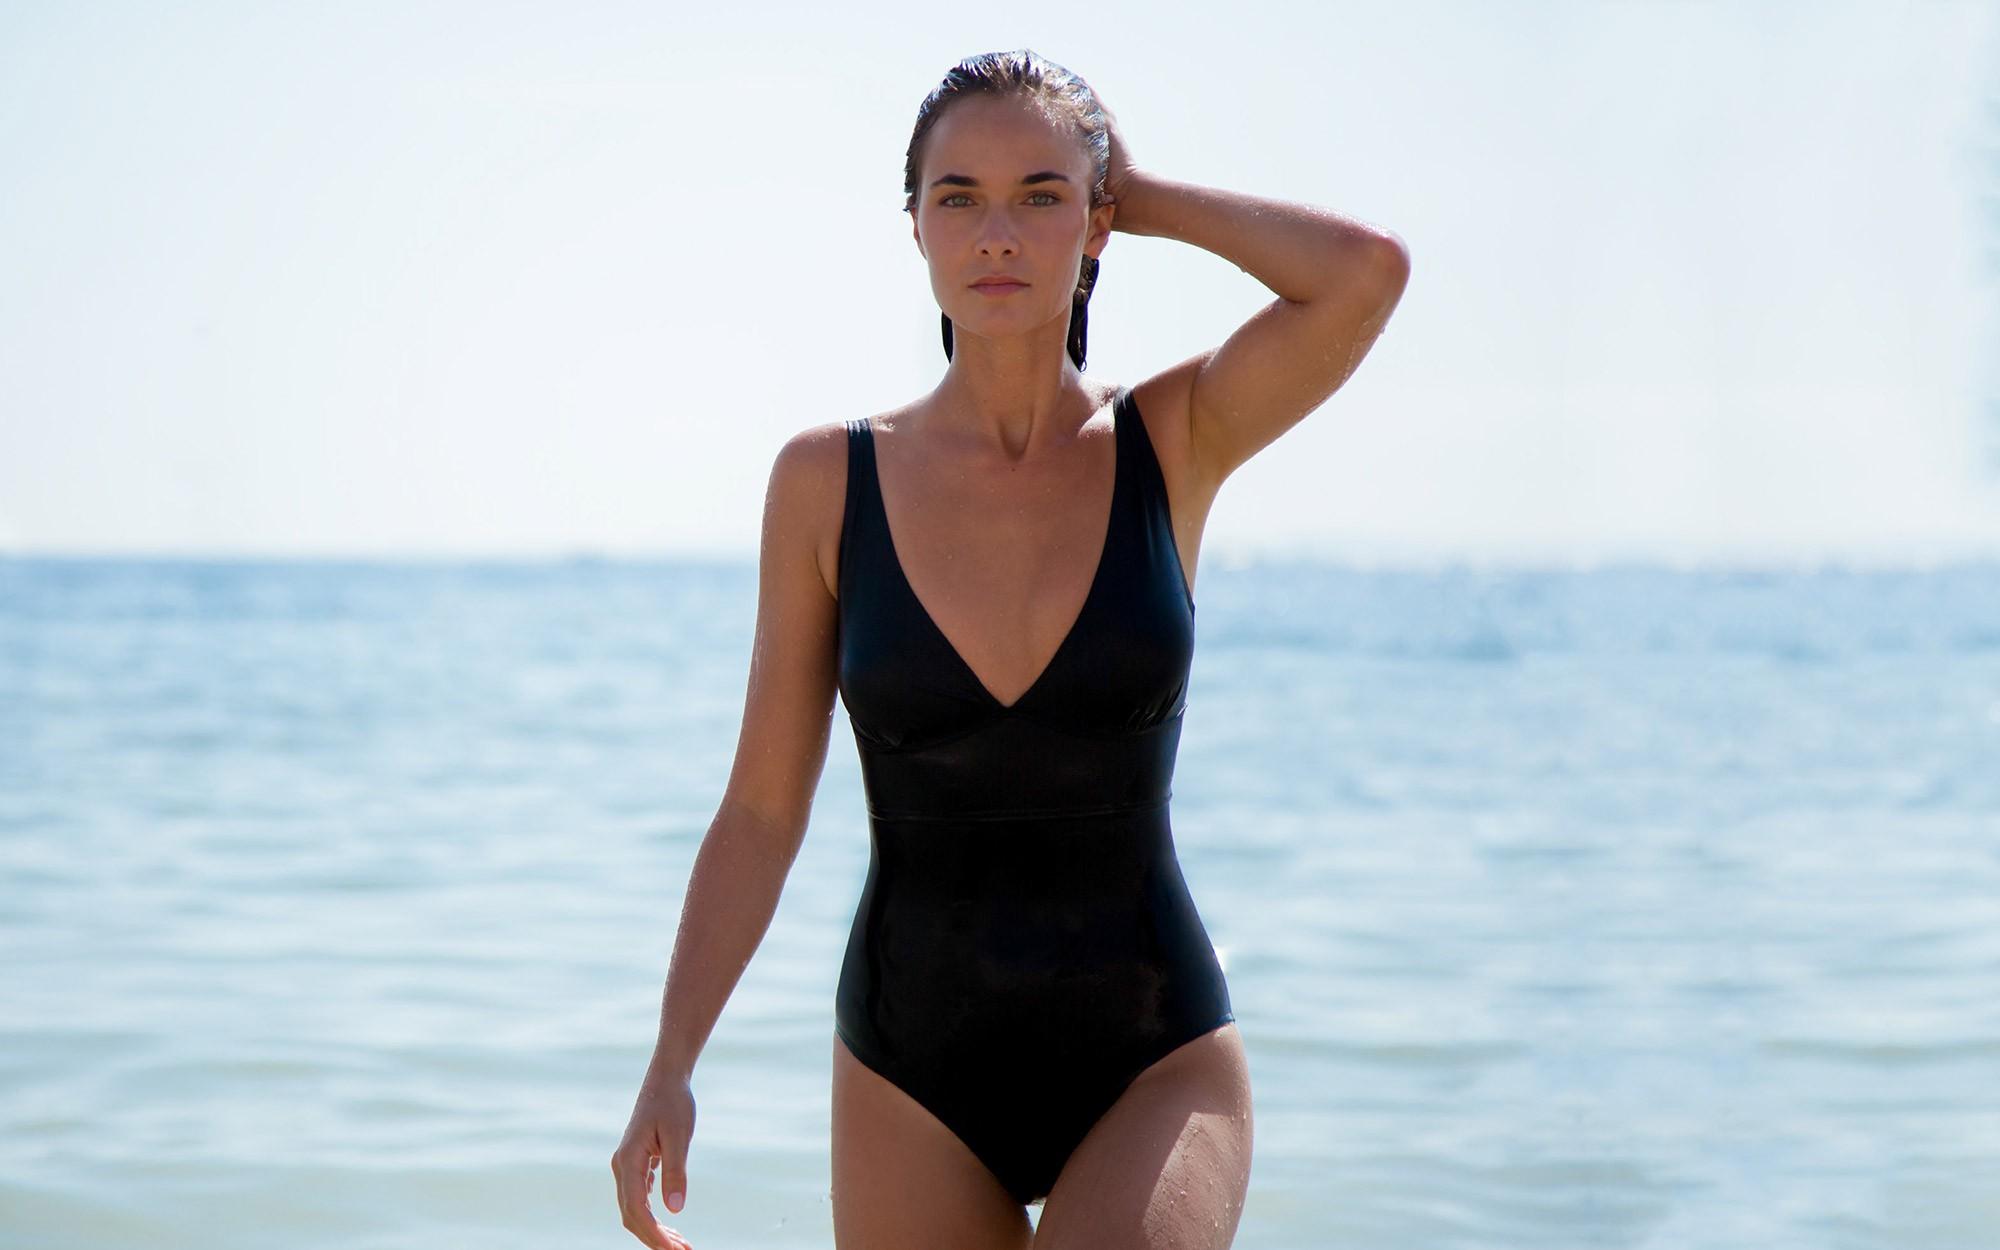 The black swimsuit